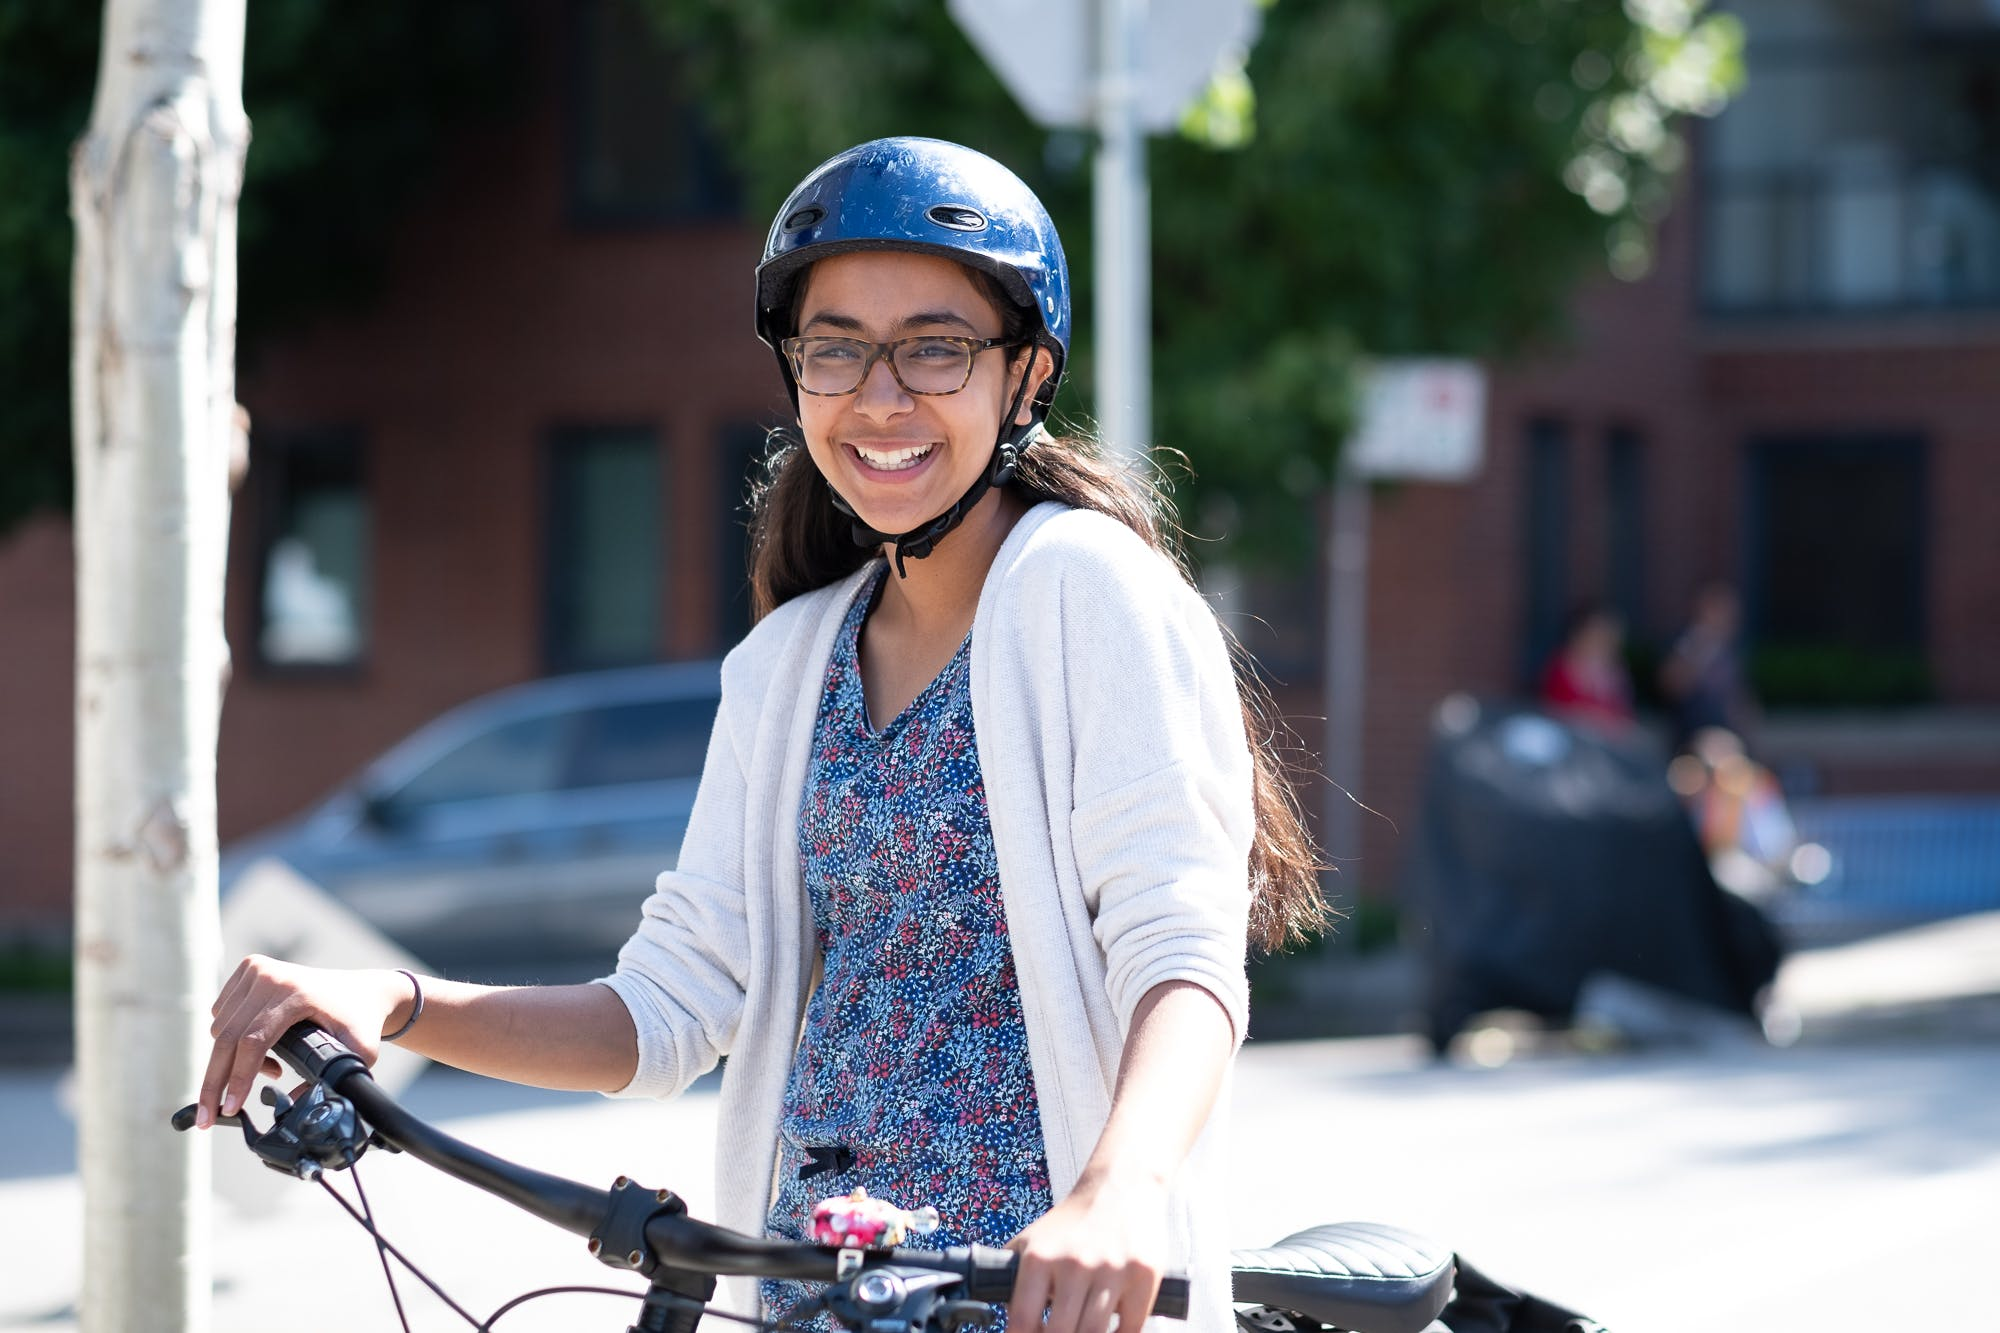 Cycling on Alexander Street